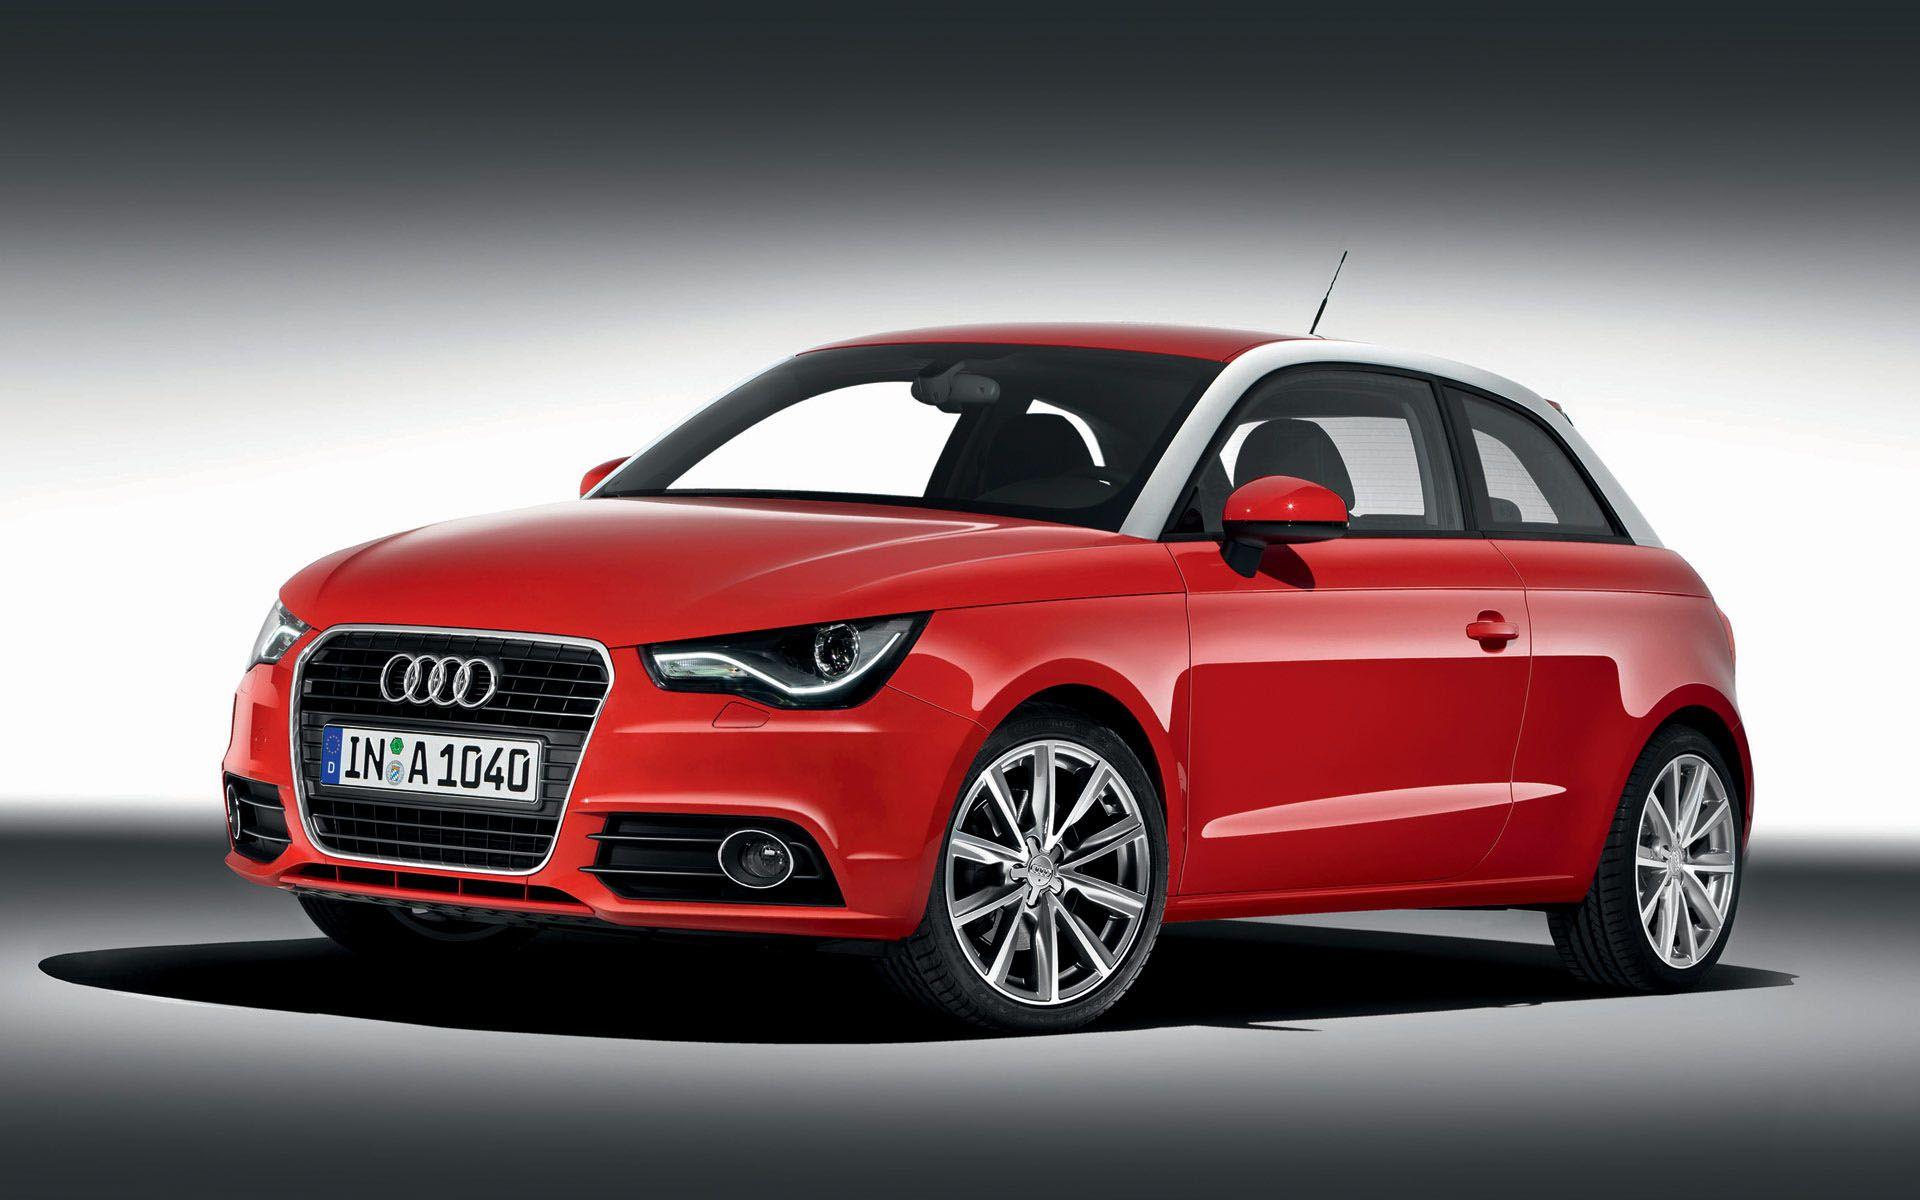 Audi 0009 Audi A1 Audi Cars Audi